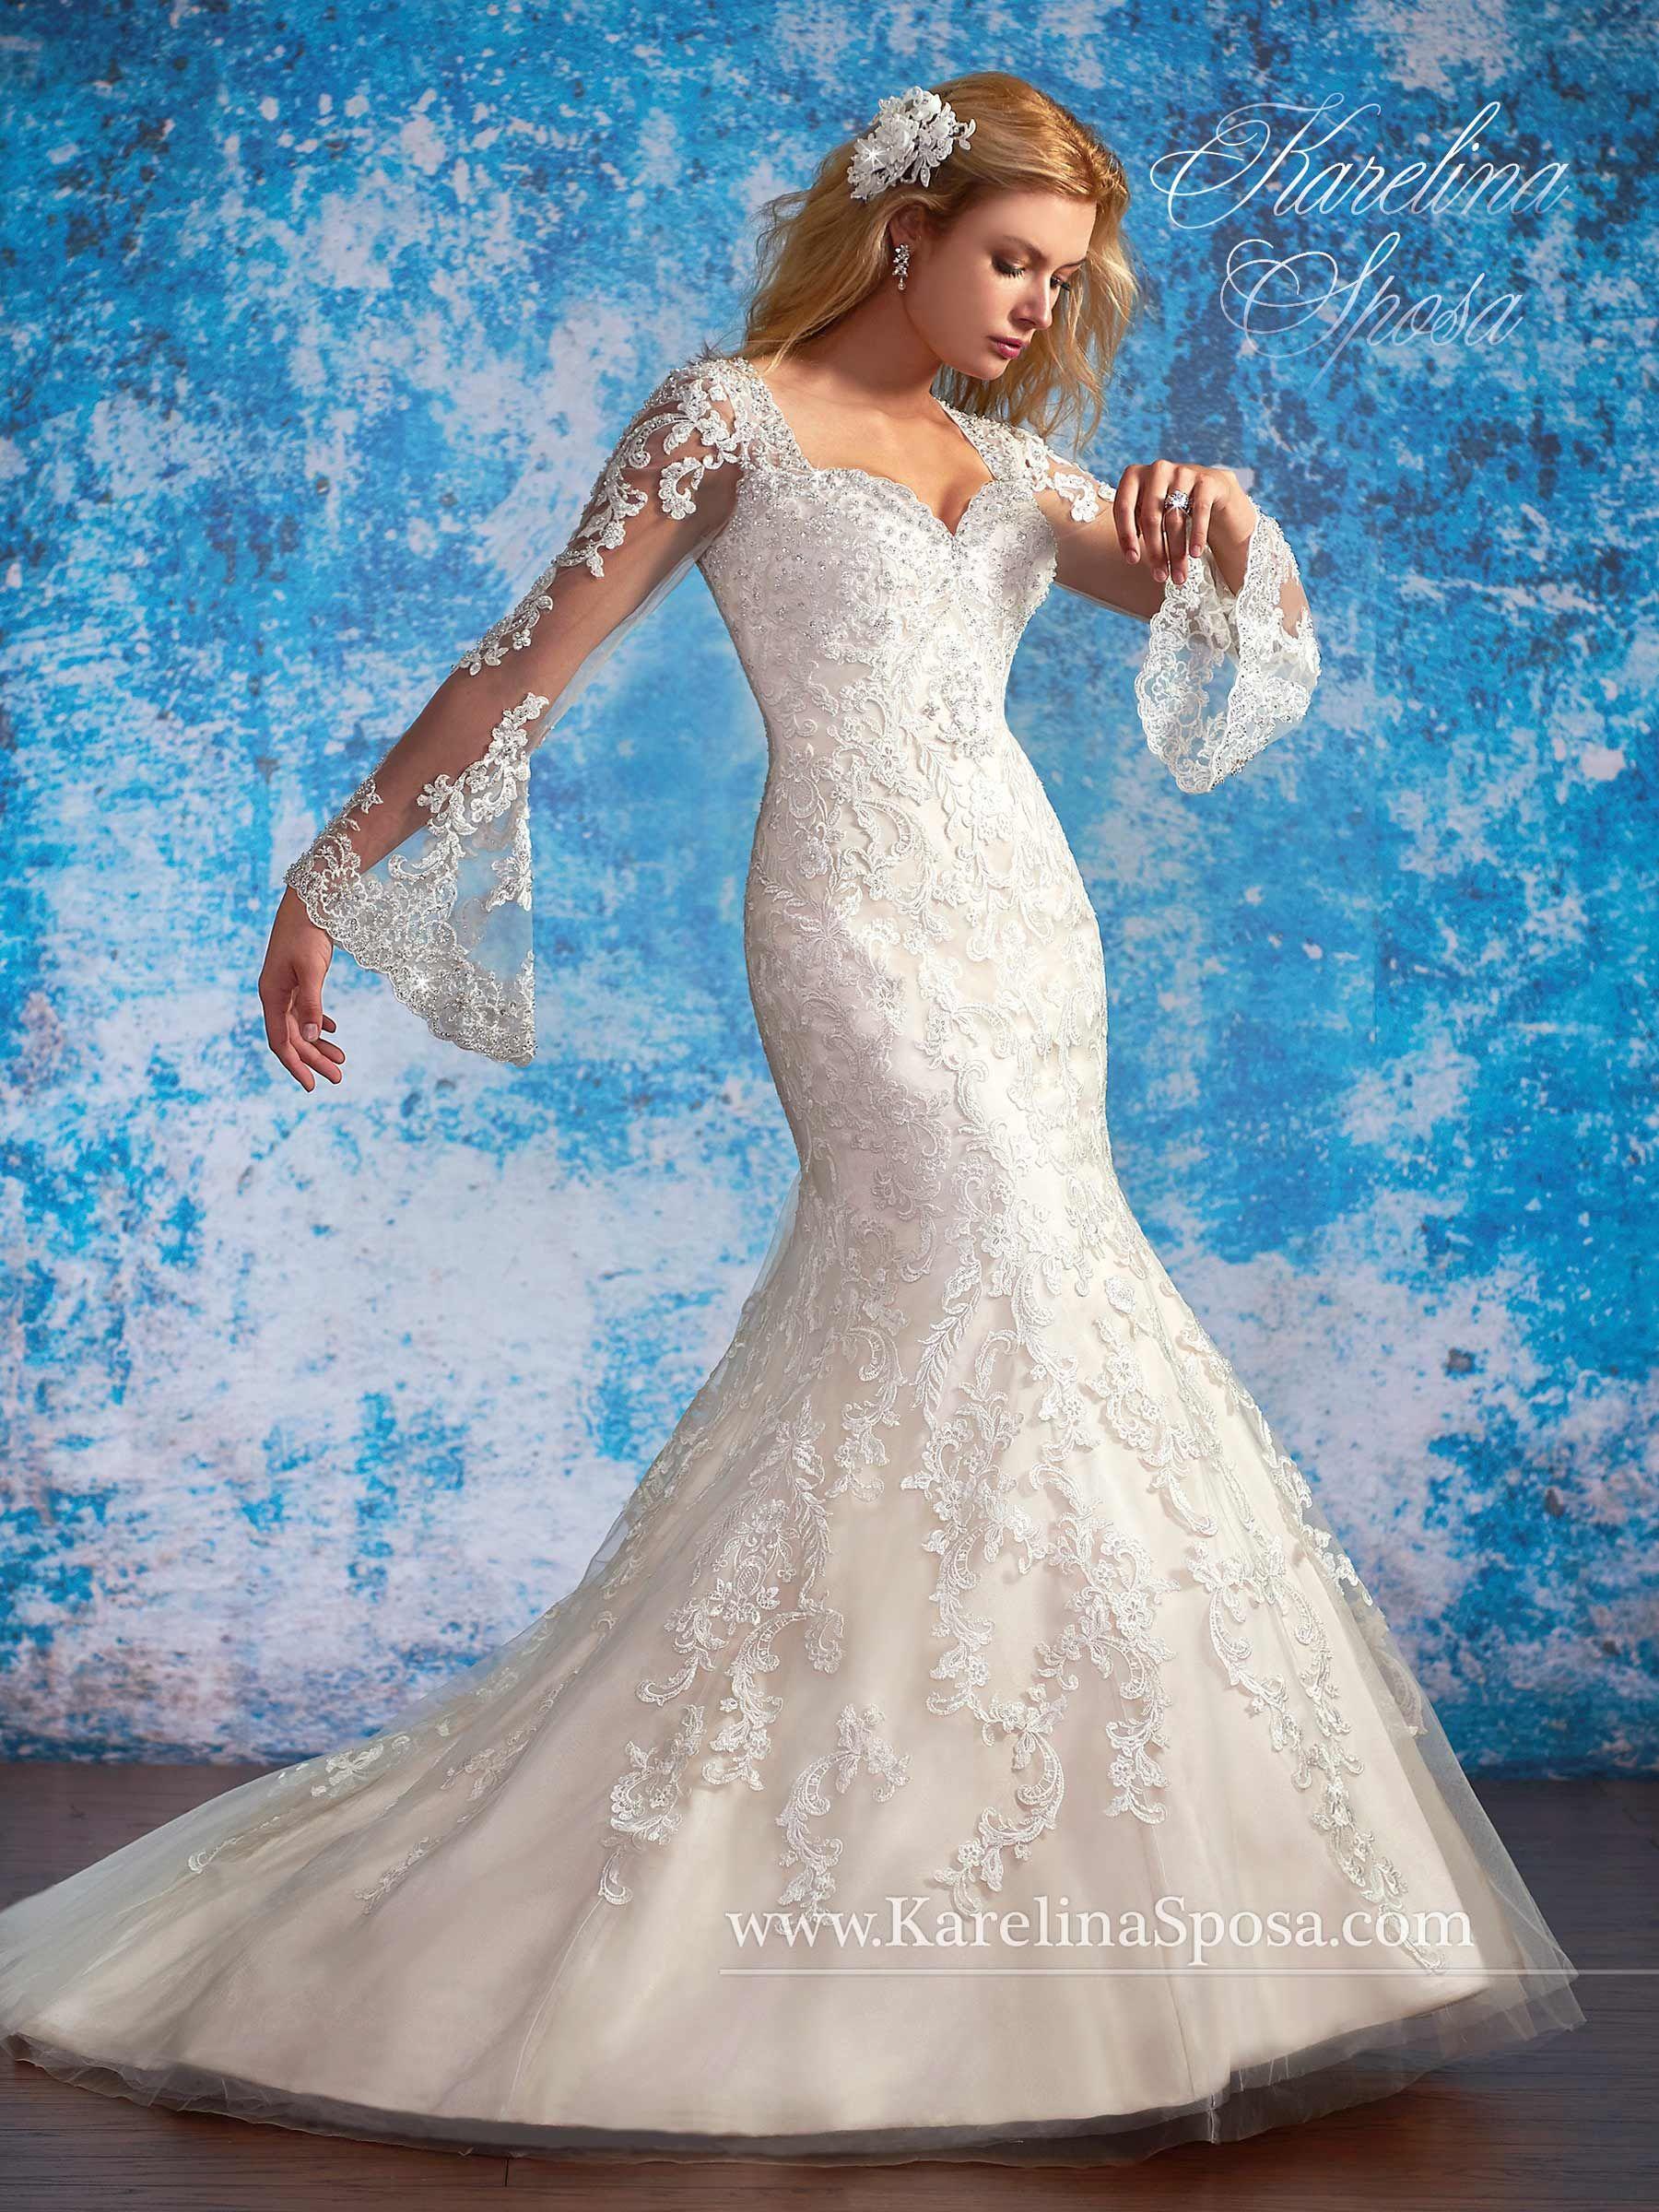 Amazing Lady Mary Wedding Dress Ideas - Womens Dresses & Gowns ...